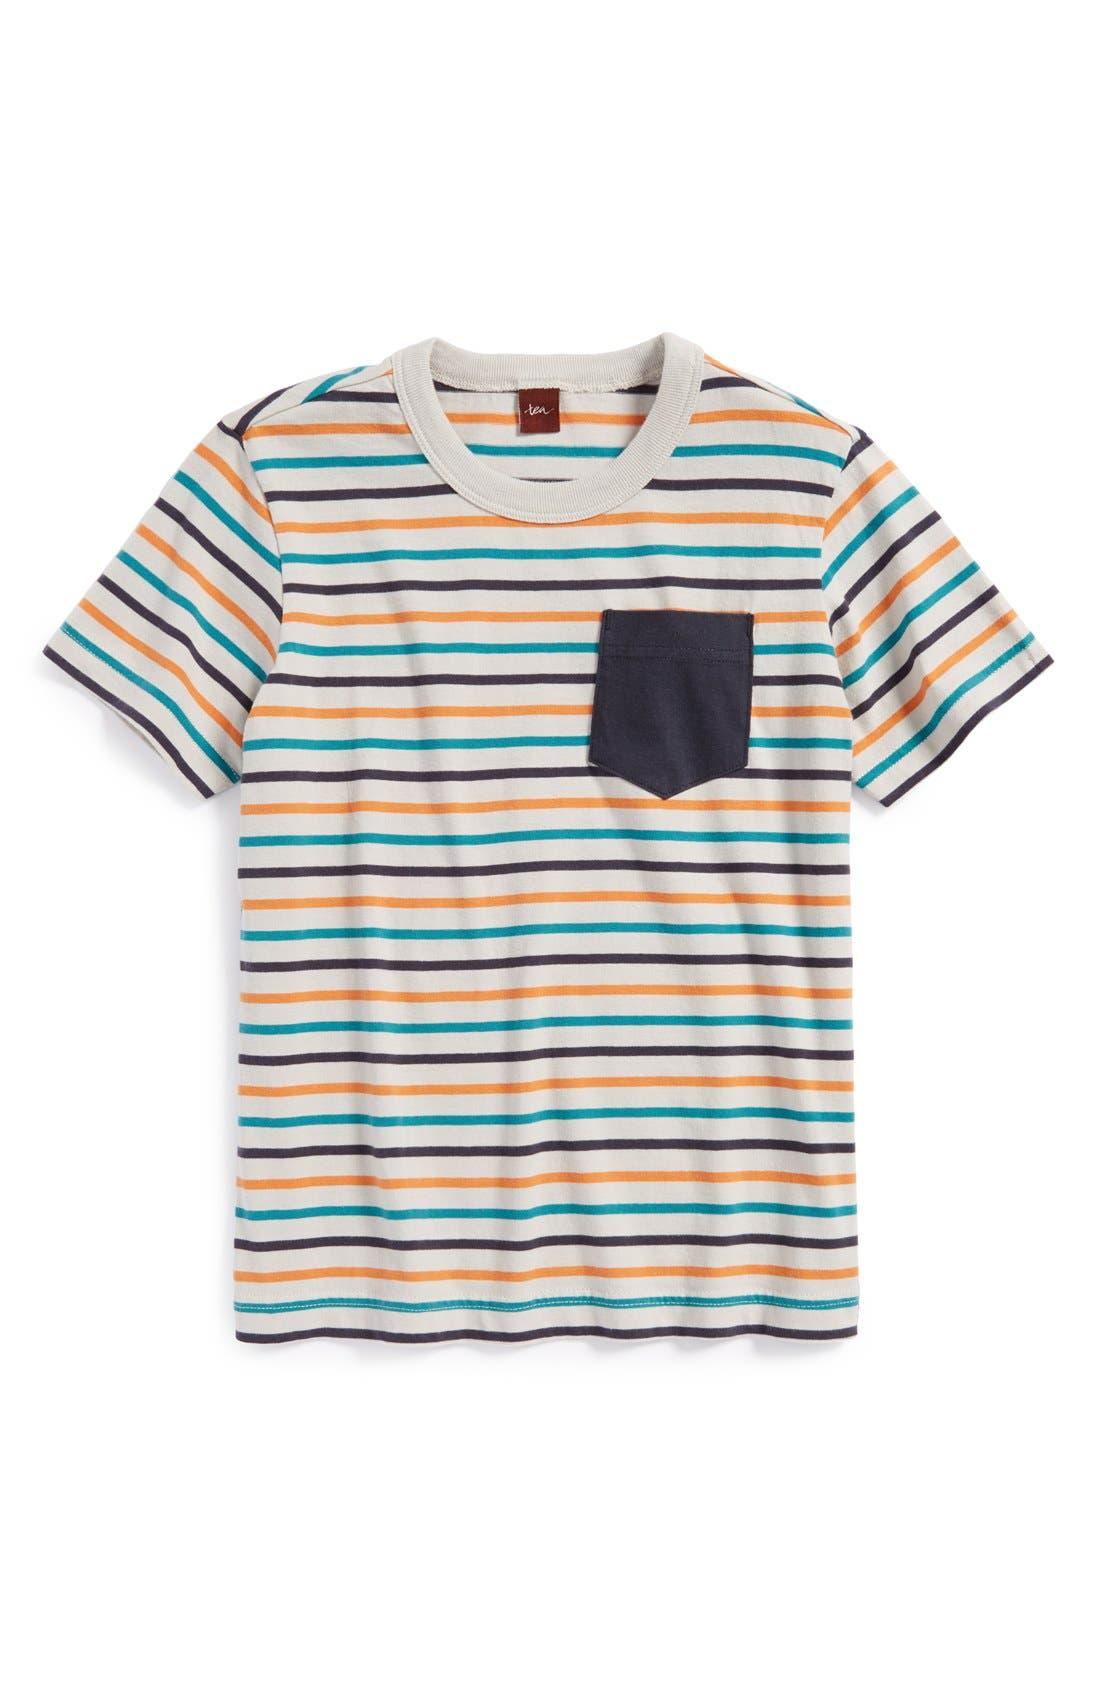 Alternate Image 1 Selected - Tea Collection 'Elbe' Stripe Cotton T-Shirt (Toddler Boys & Little Boys)